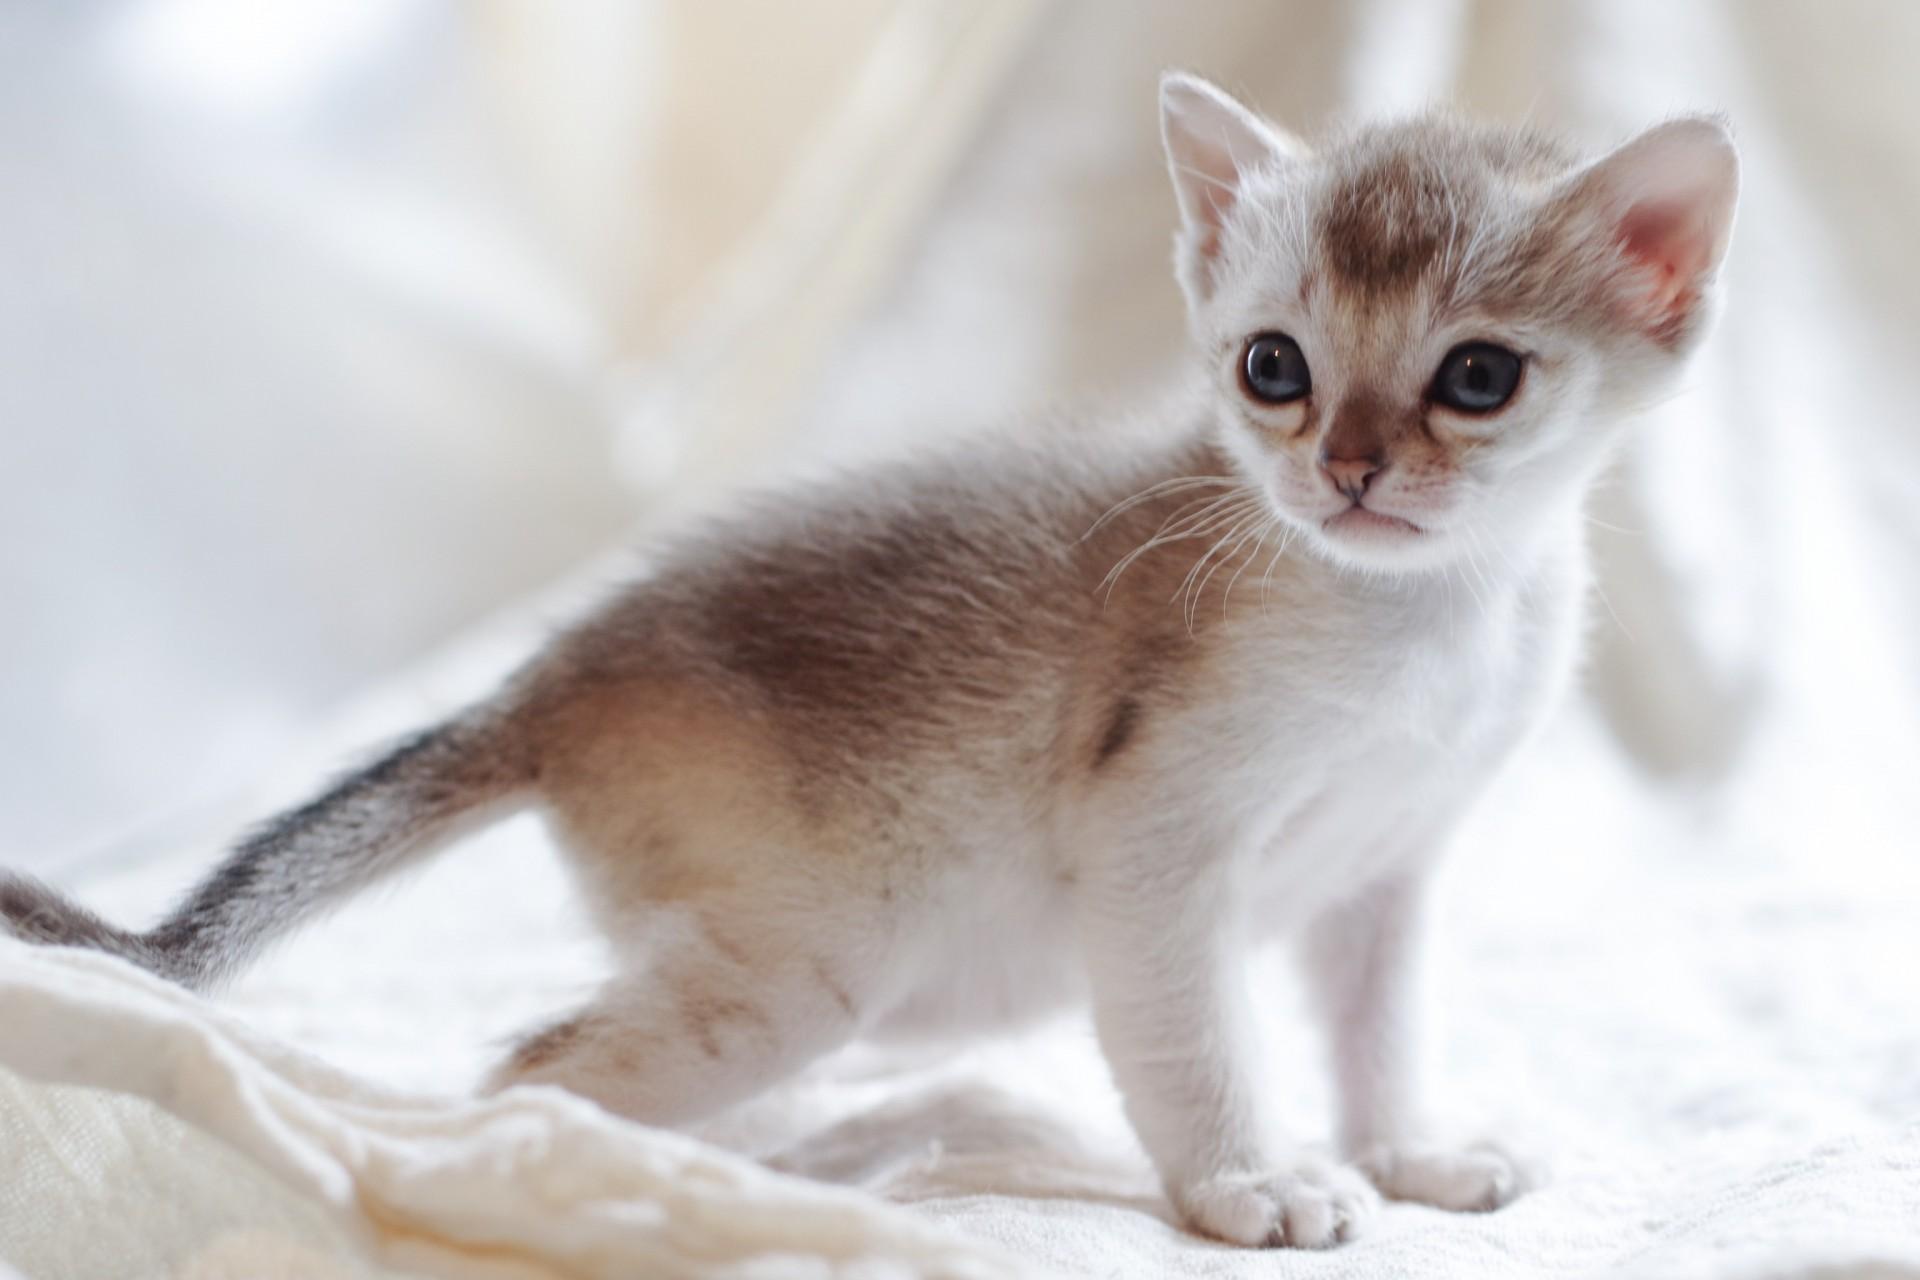 Singapura Kitten: Singapura Update Singapura Kittens Mar Breed